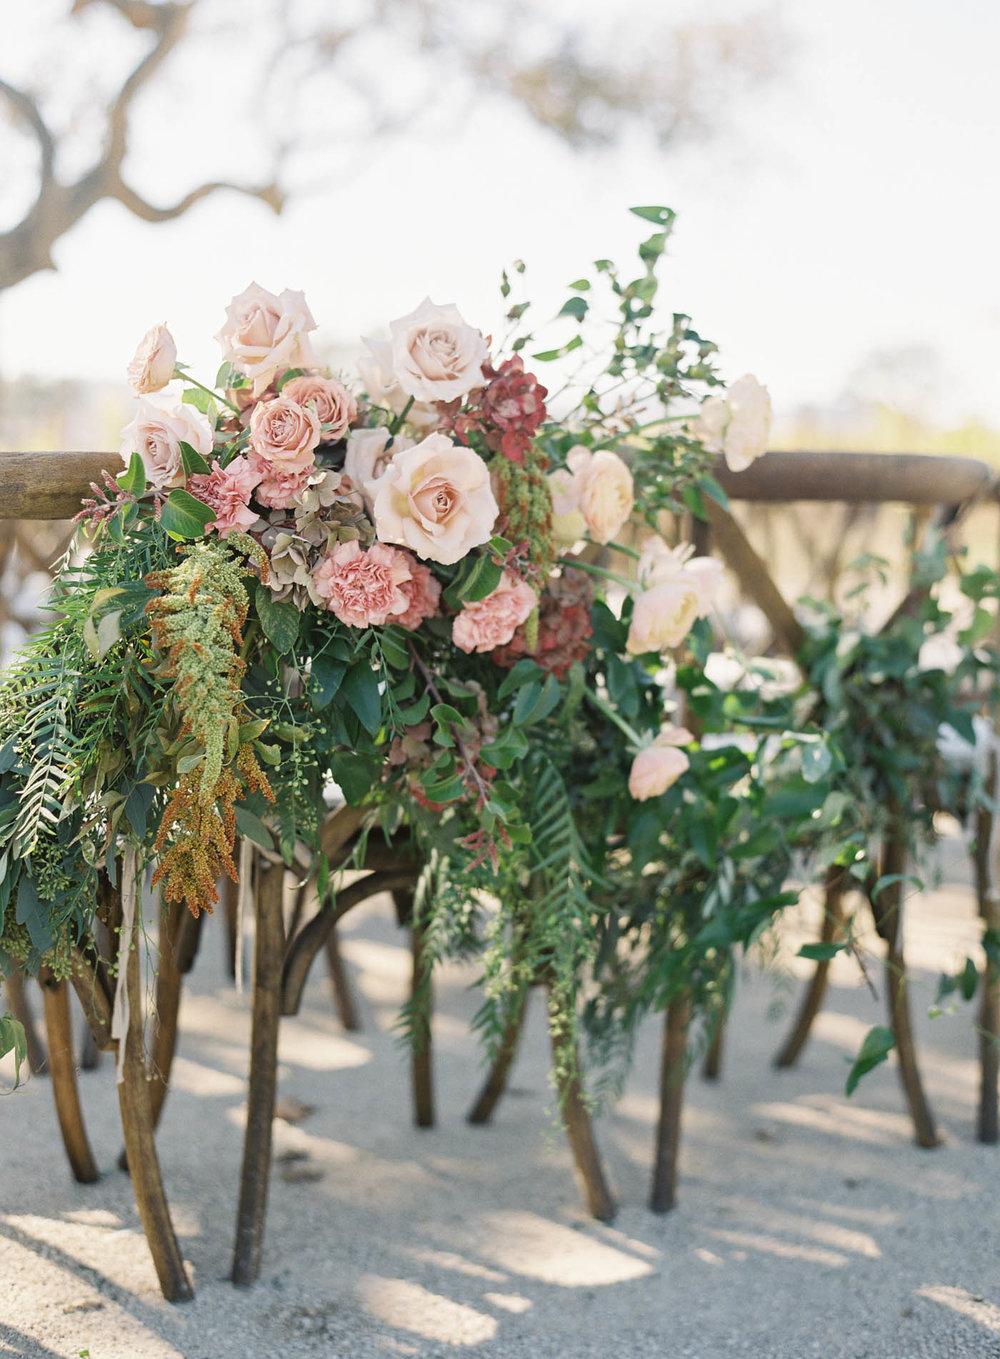 sunstone-villa-wedding-14-Jen_Huang-RD-52-Jen_Huang-009589-R1-004.jpg